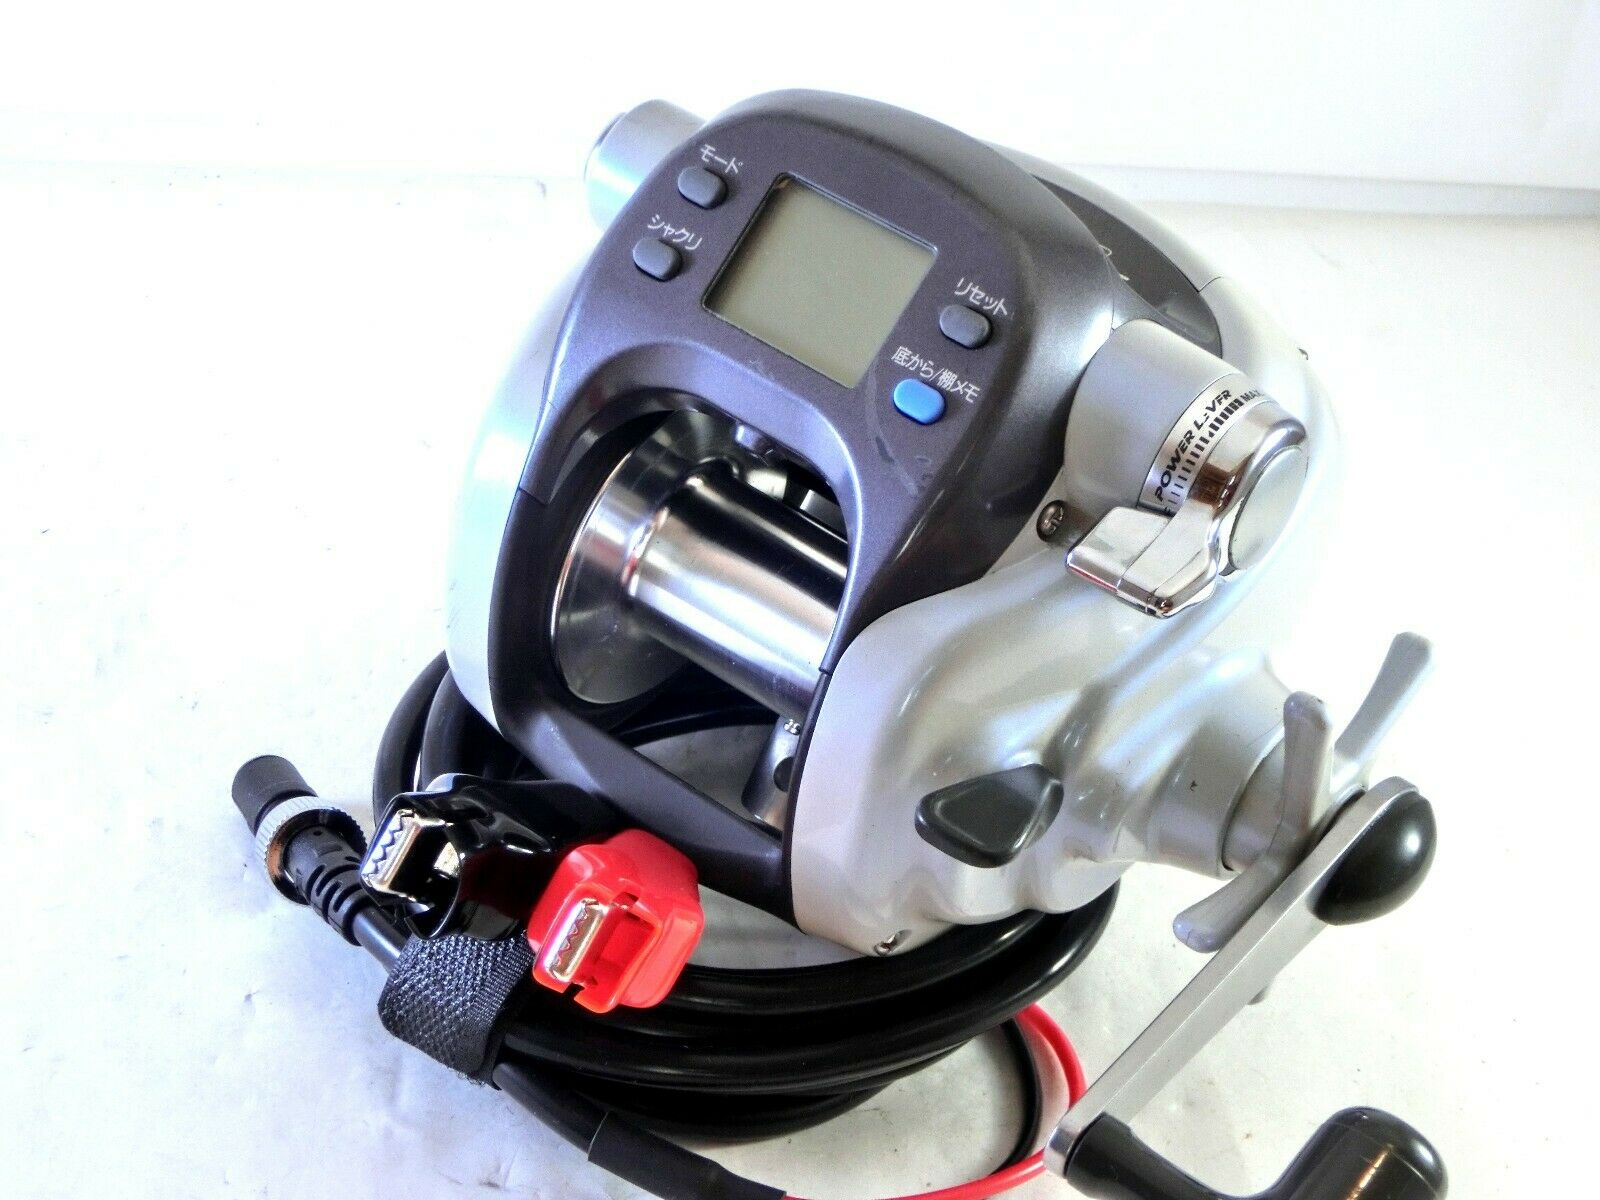 Daiwa Super Tanacom X600CP greegioco Electric reel inglese uomoual Good